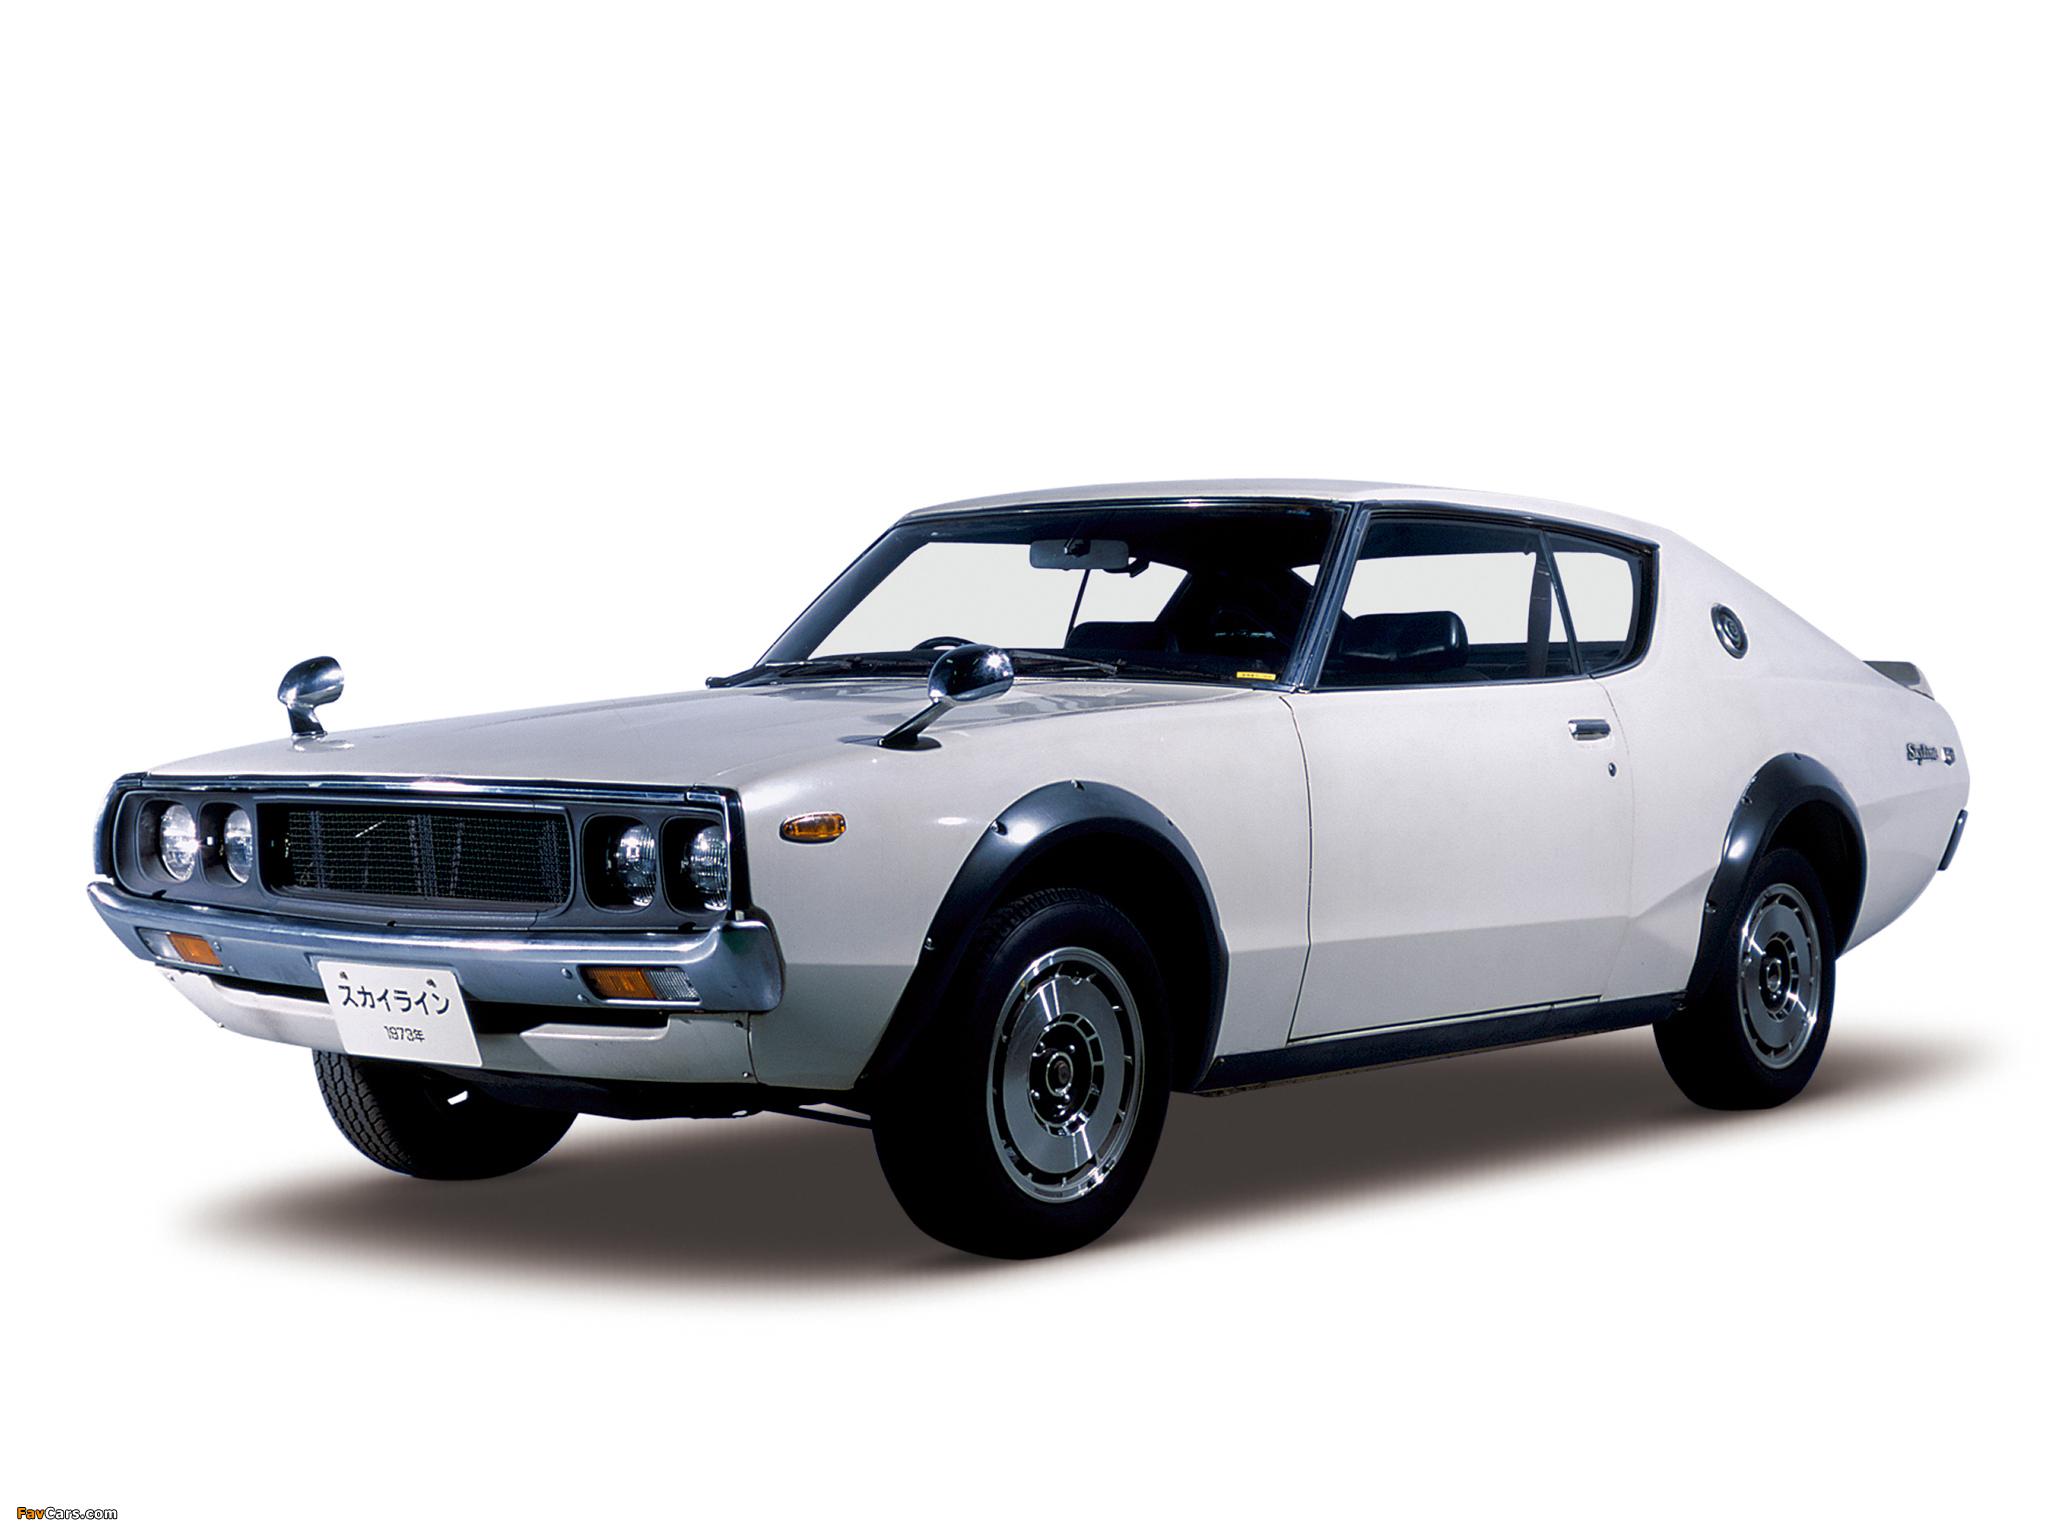 Nissan Skyline 2000GT-R (KPGC110) 1973 images (2048 x 1536)